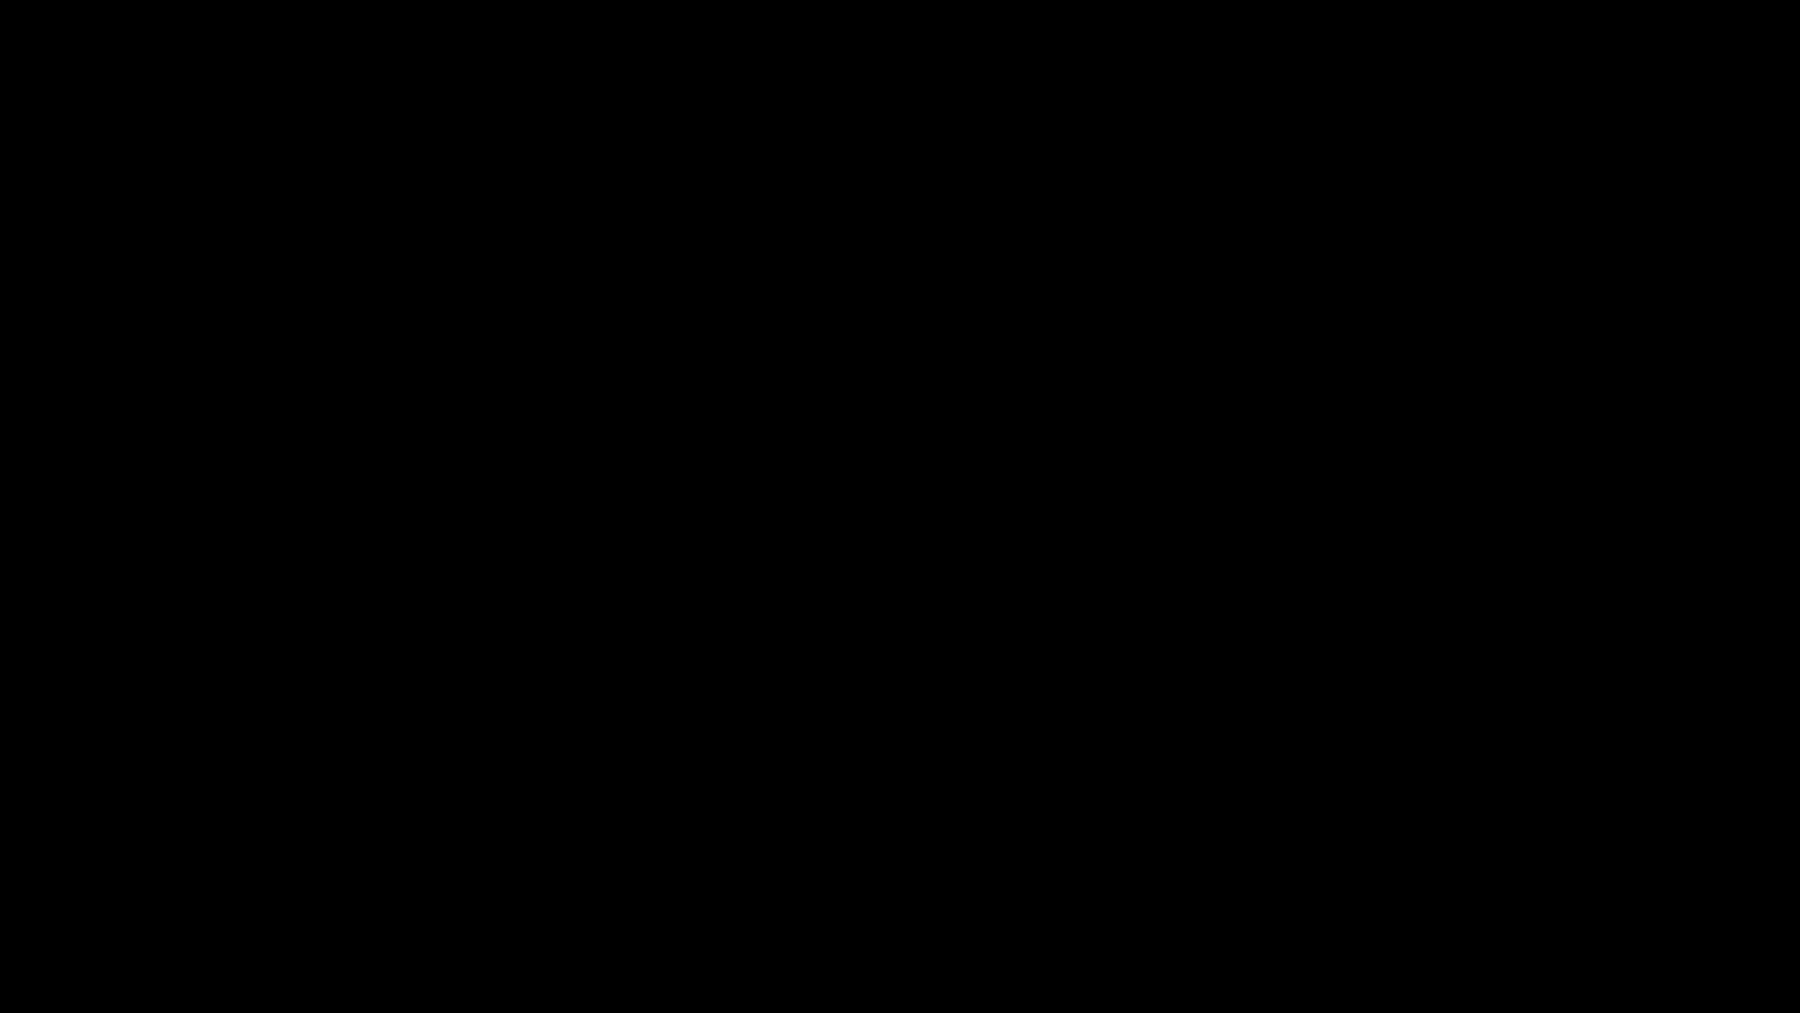 czrne tło